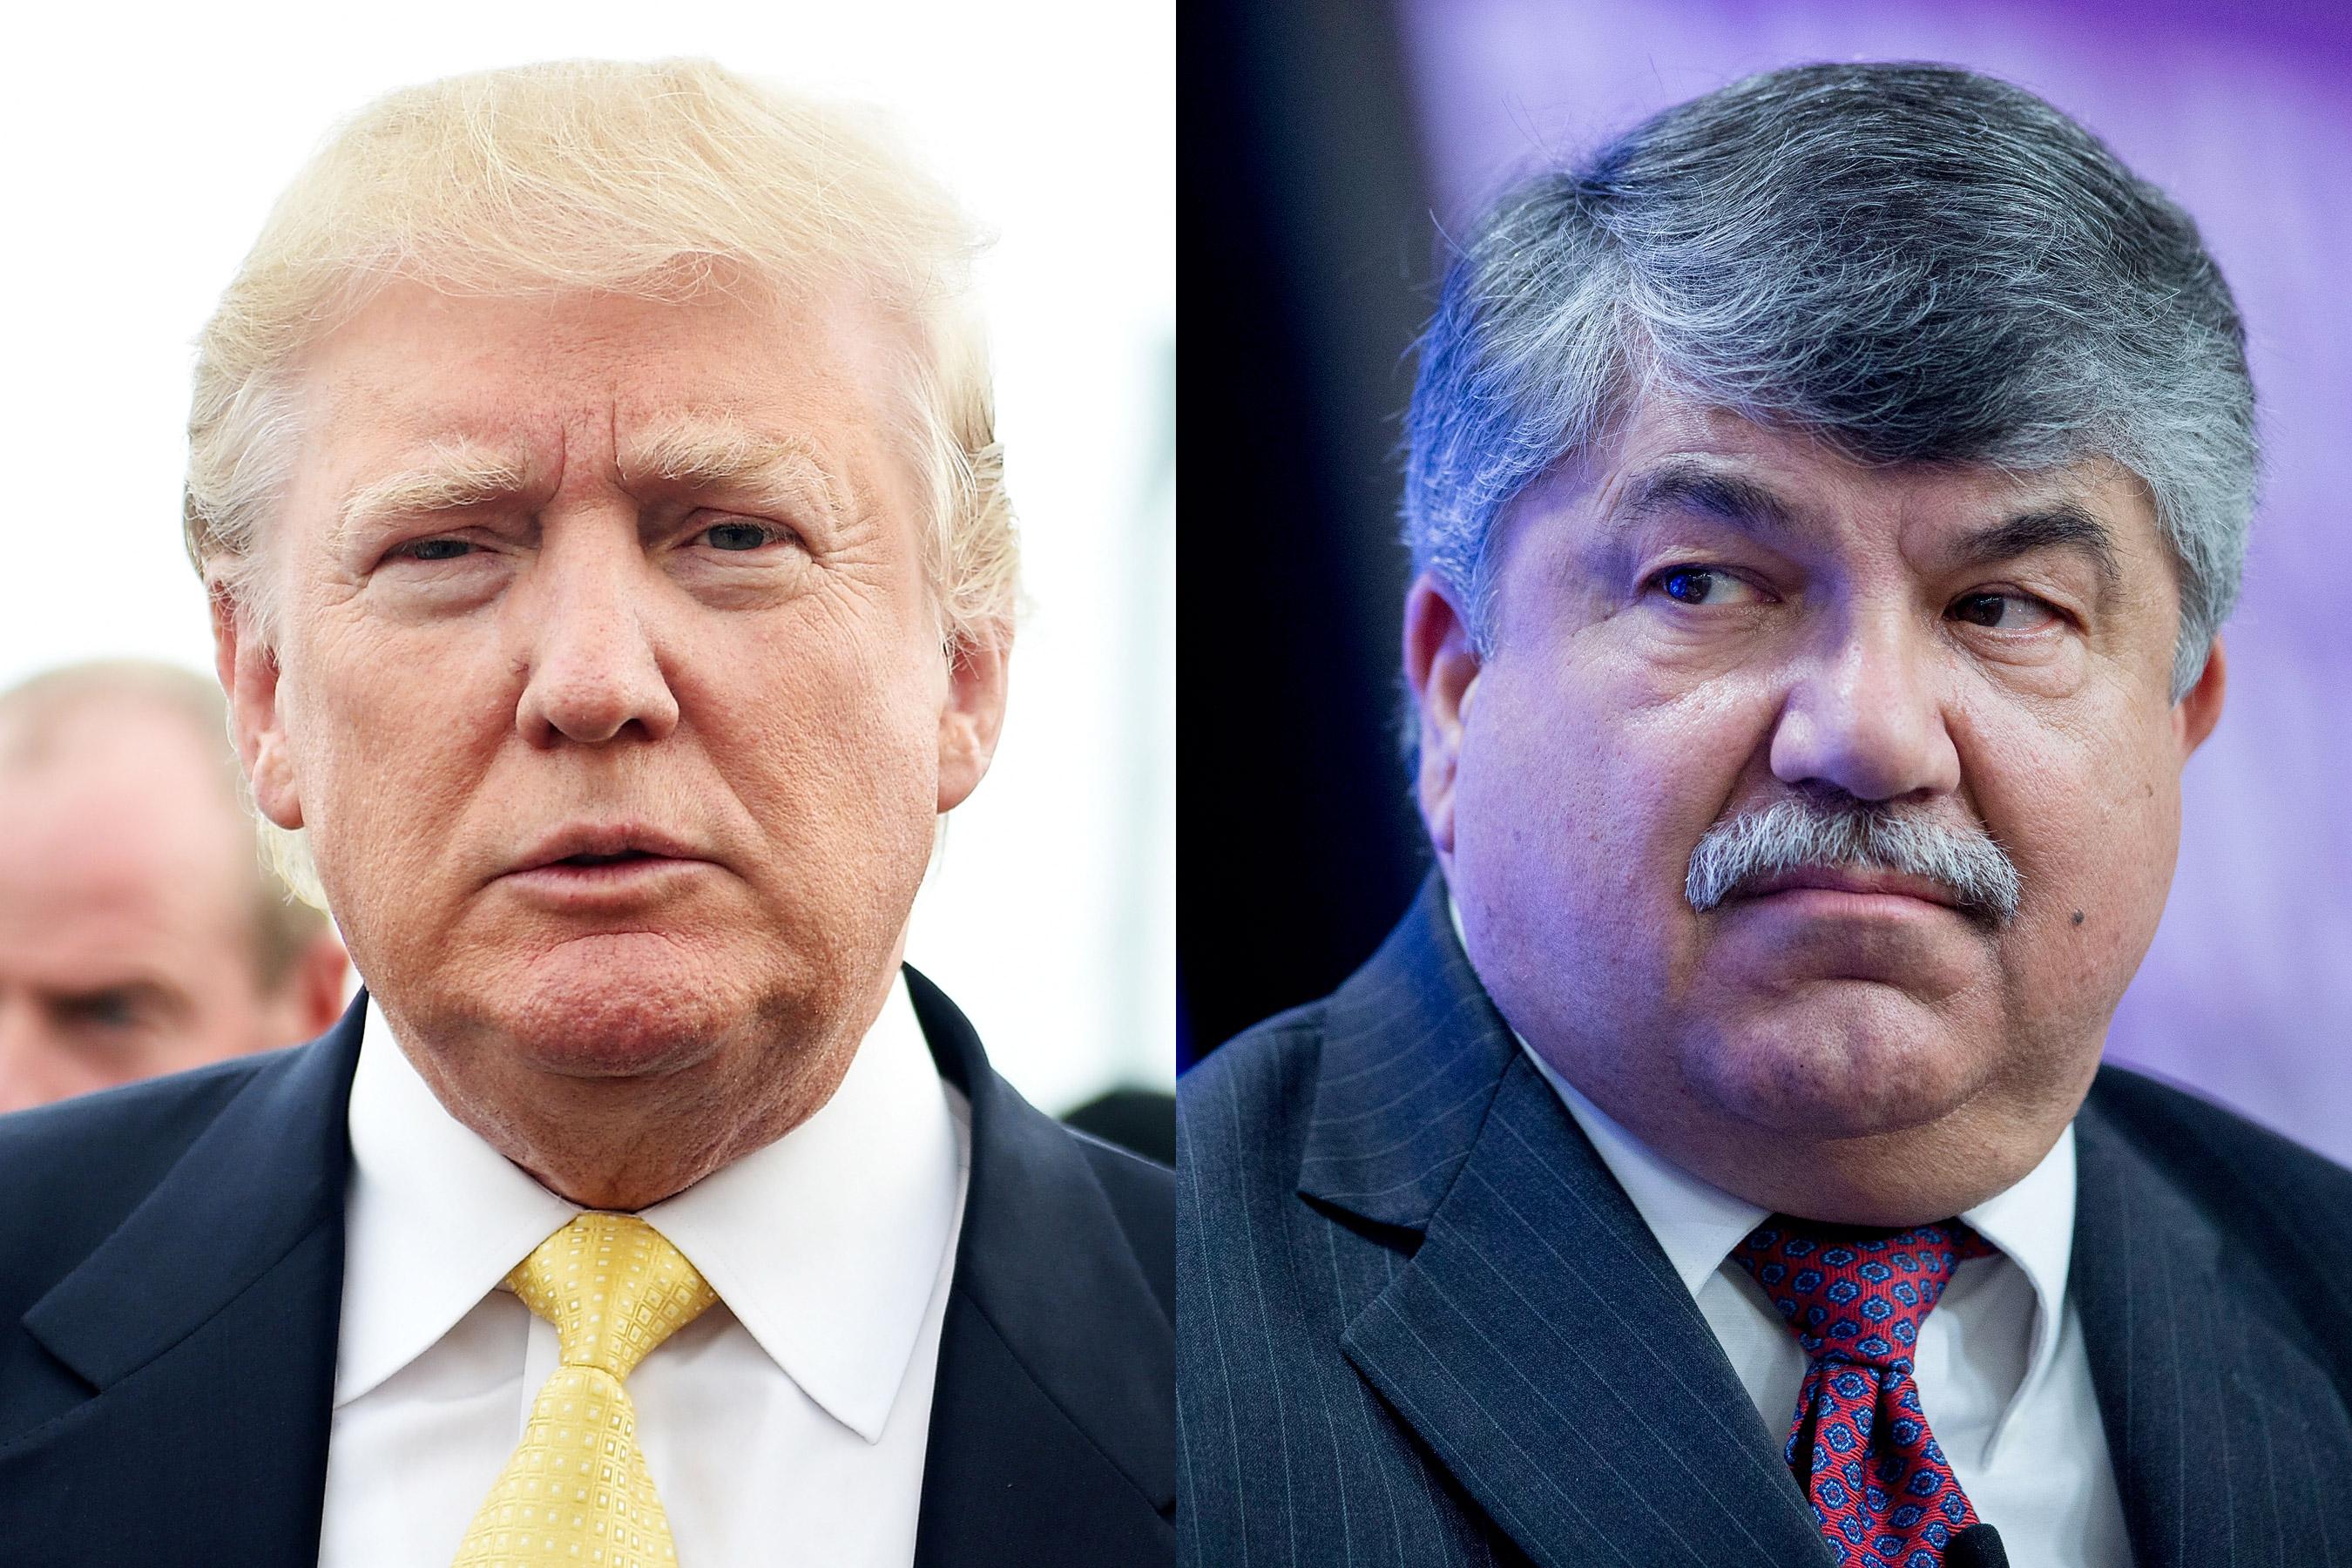 From left: Donald Trump; Richard Trumka